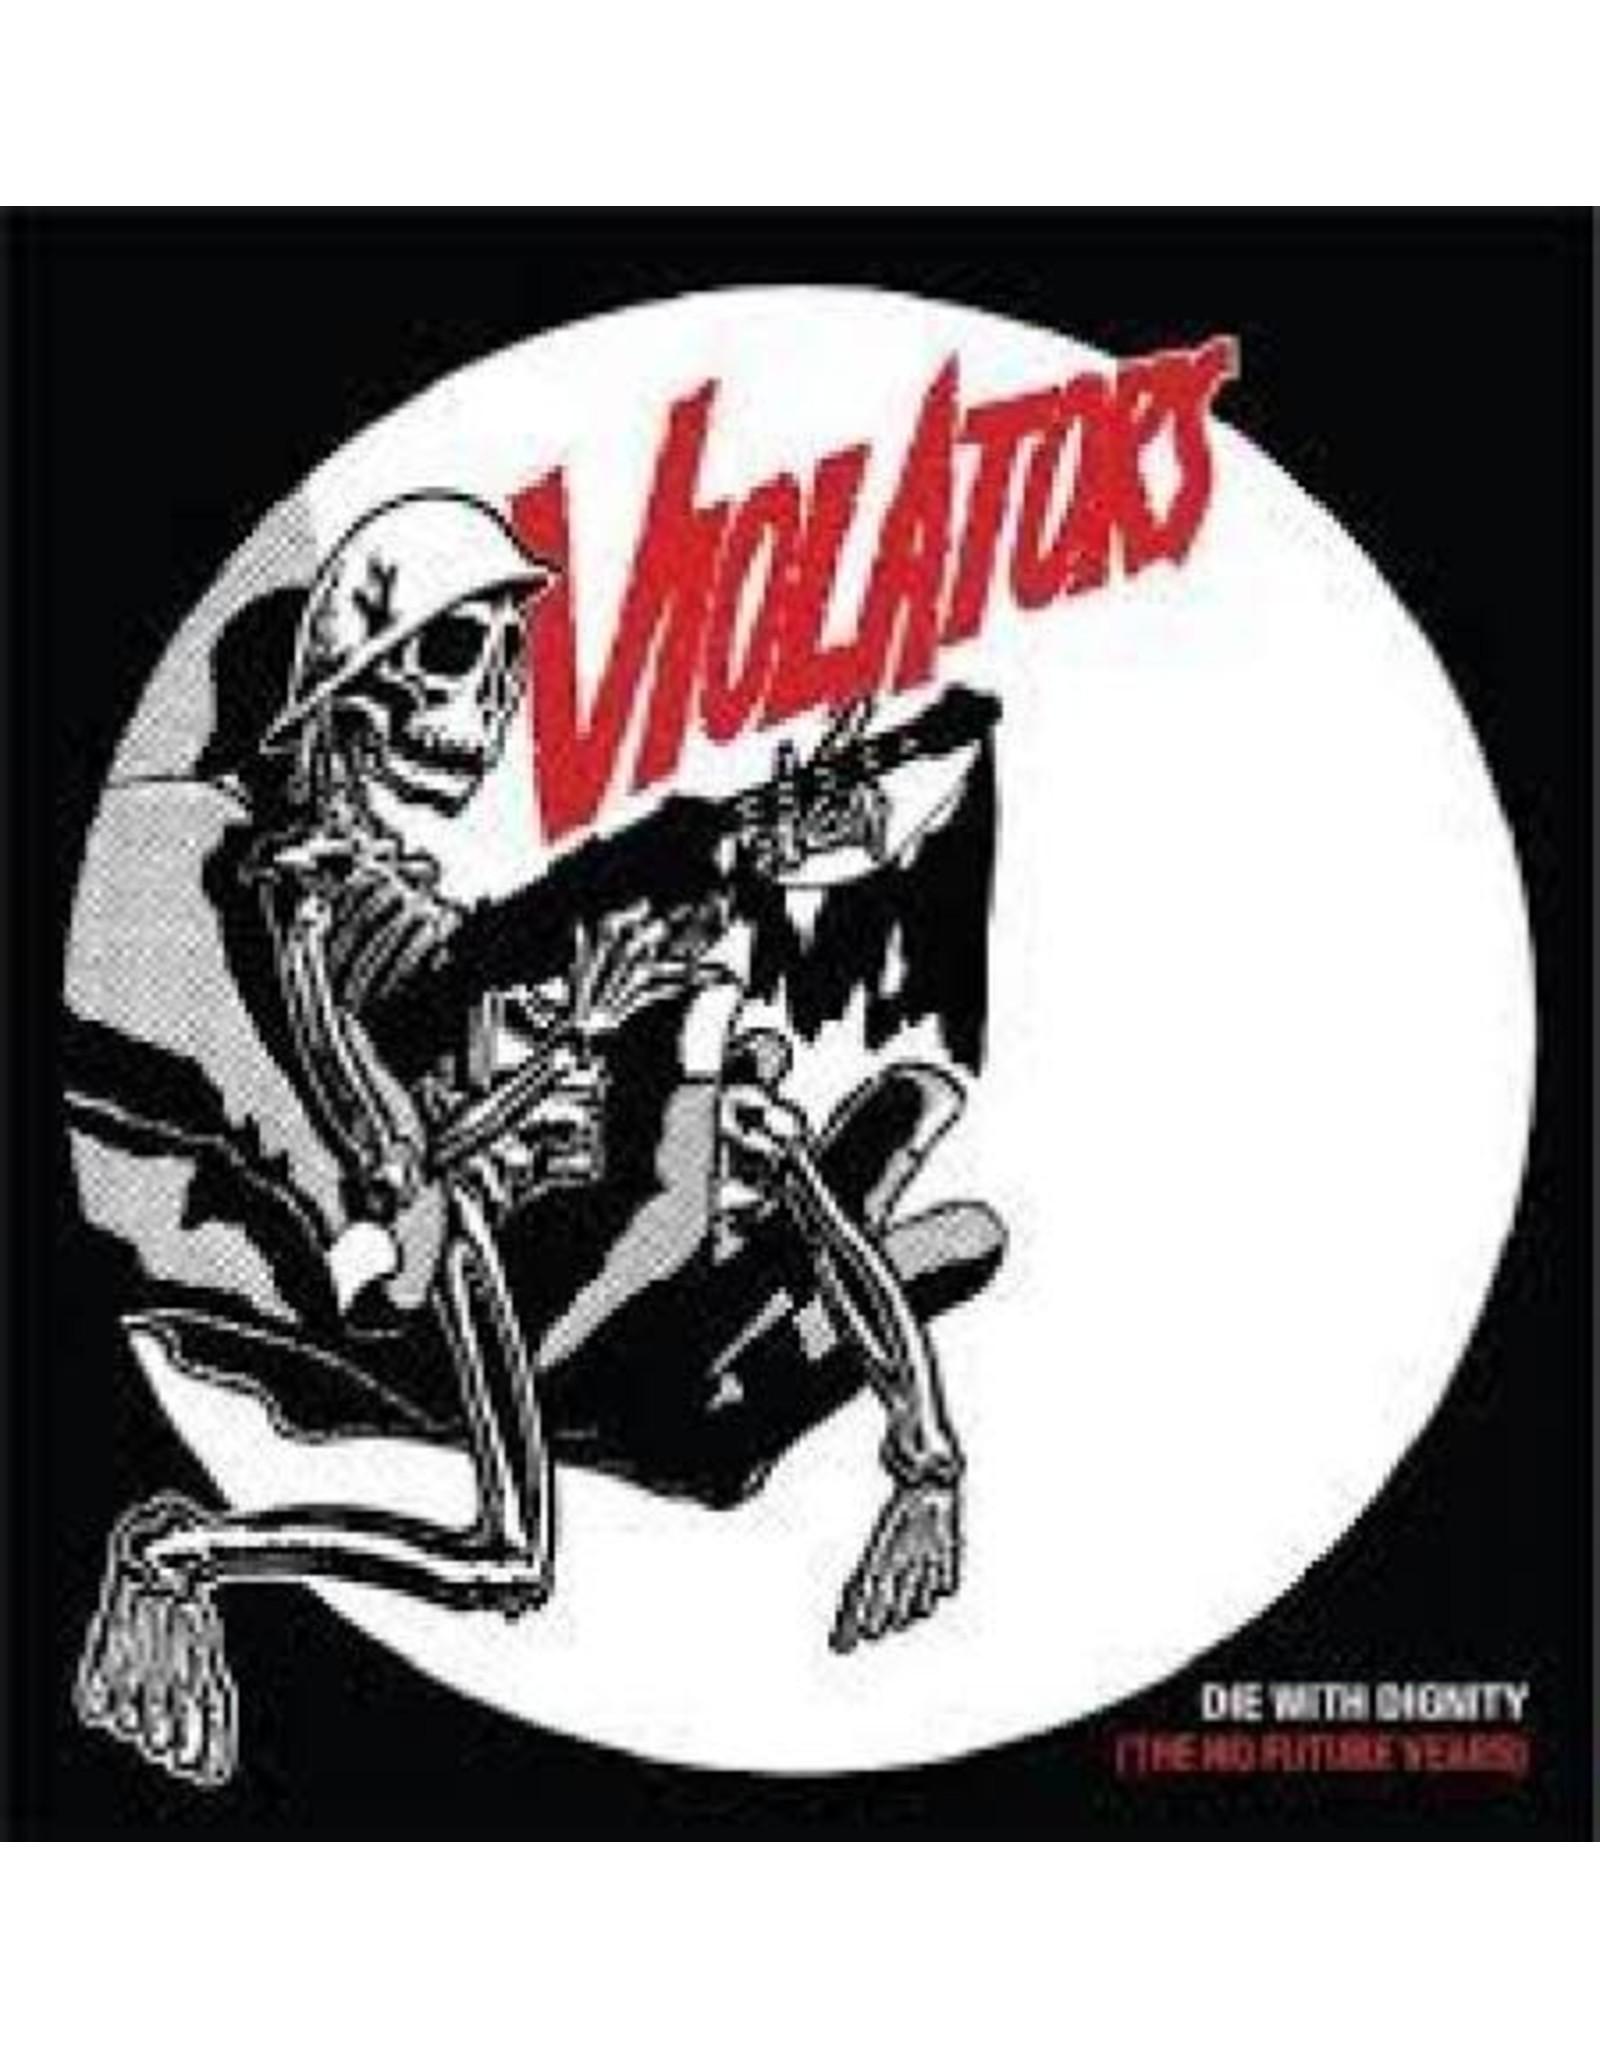 New Vinyl Violators - Die With Dignity (The No Future Years) LP